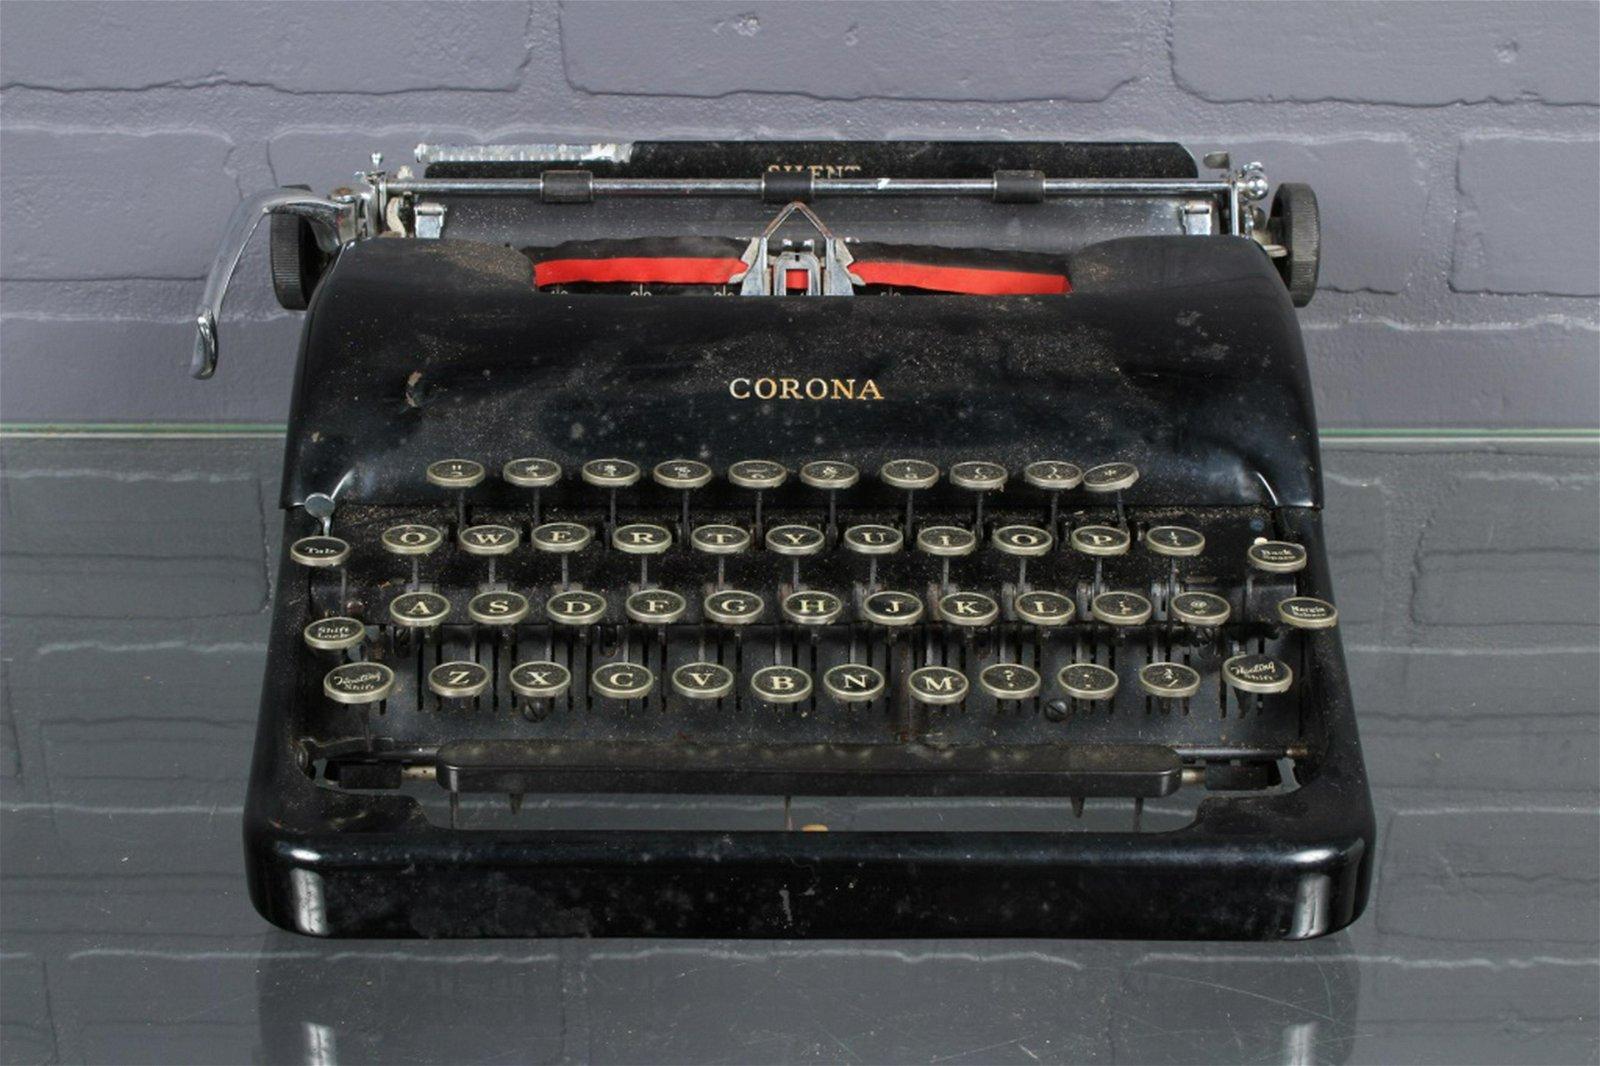 LC Smith and Corona Typewriter